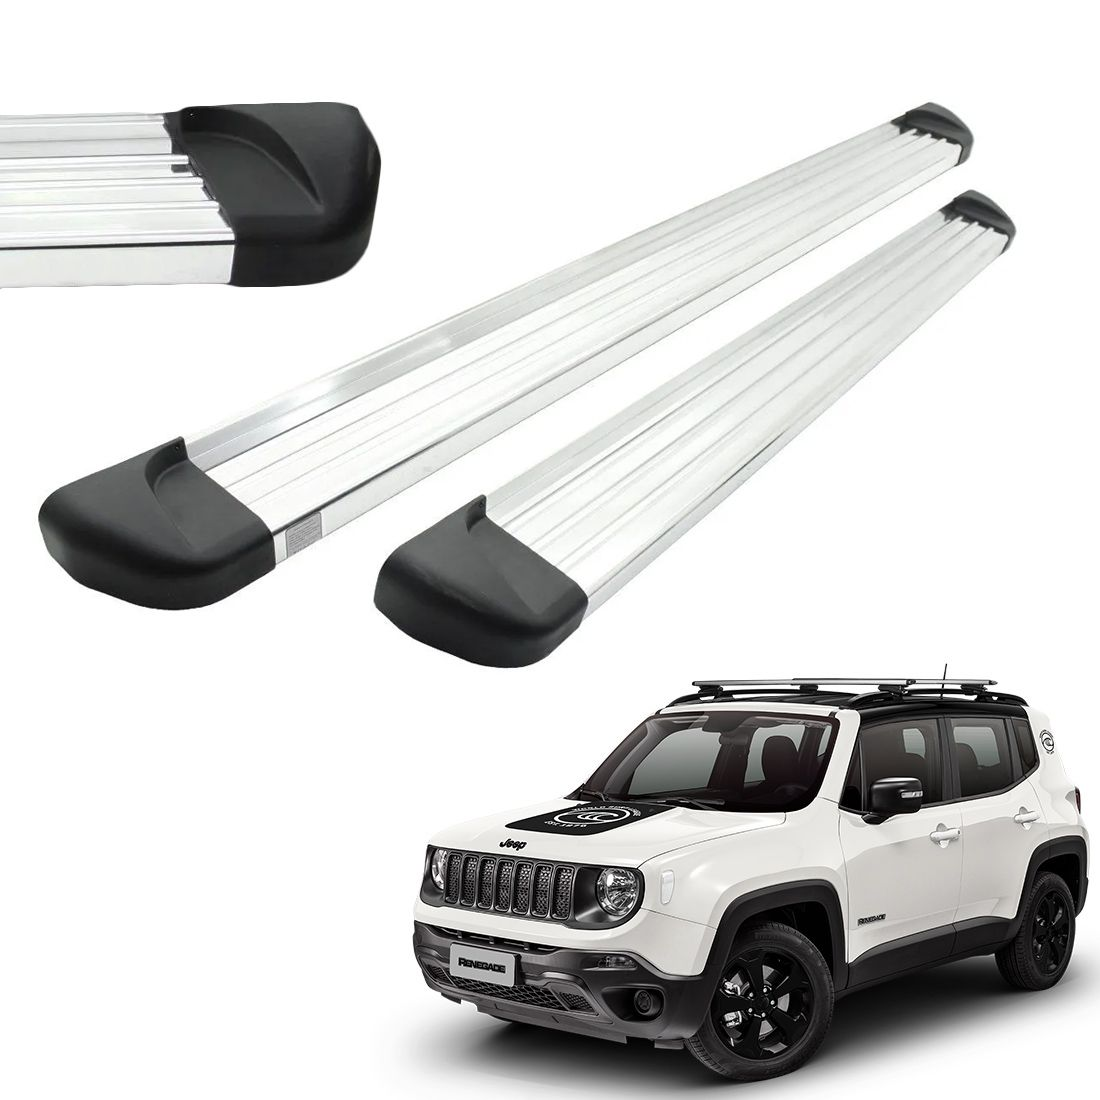 Estribo Aluminio Polido Jeep Renegade